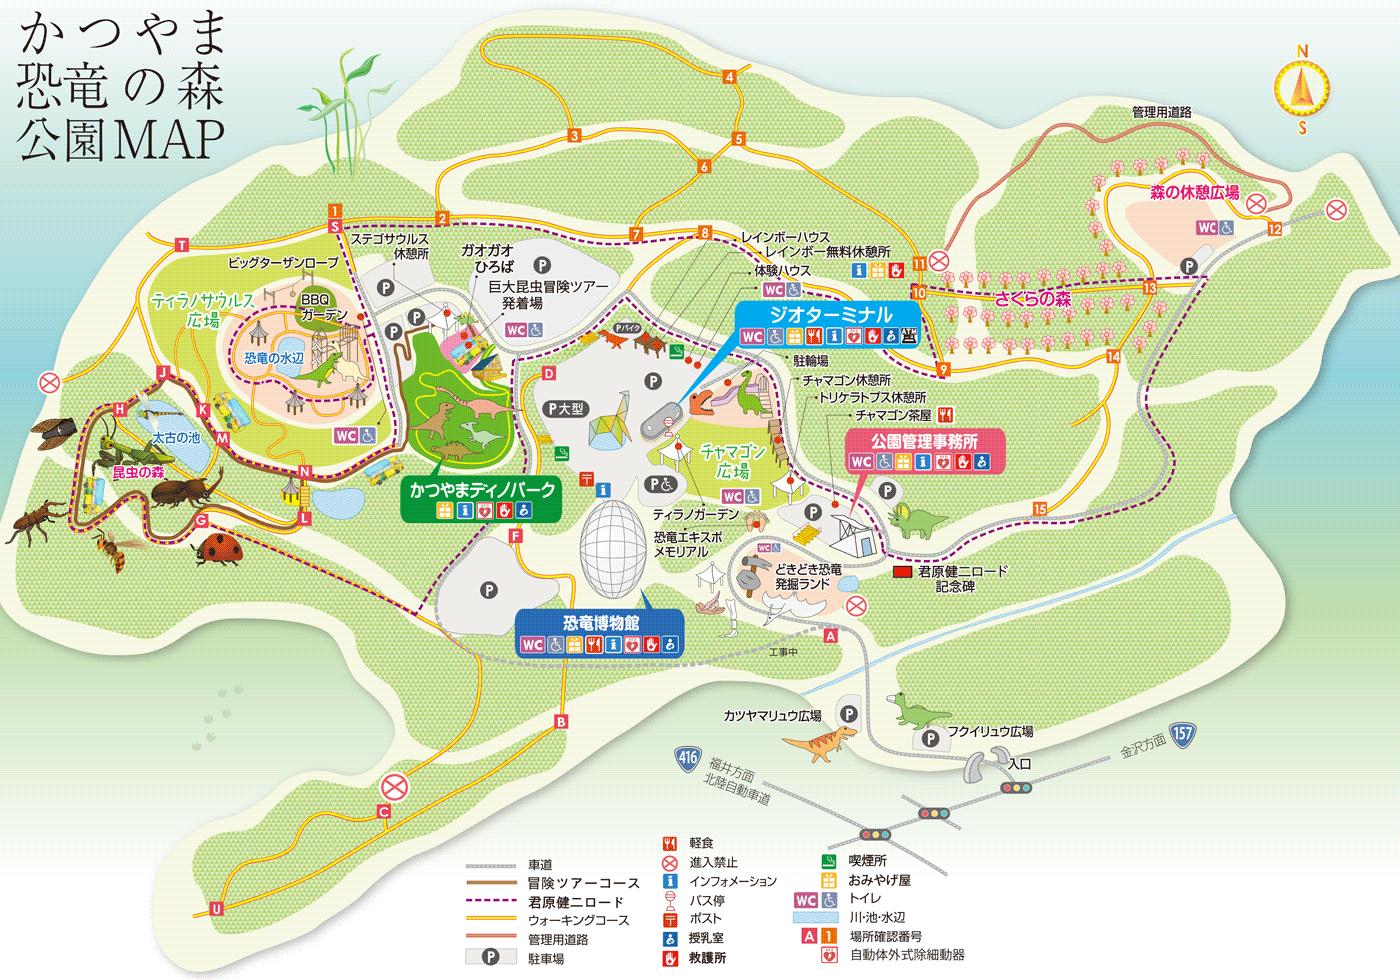 博物館 福井 ツアー 恐竜